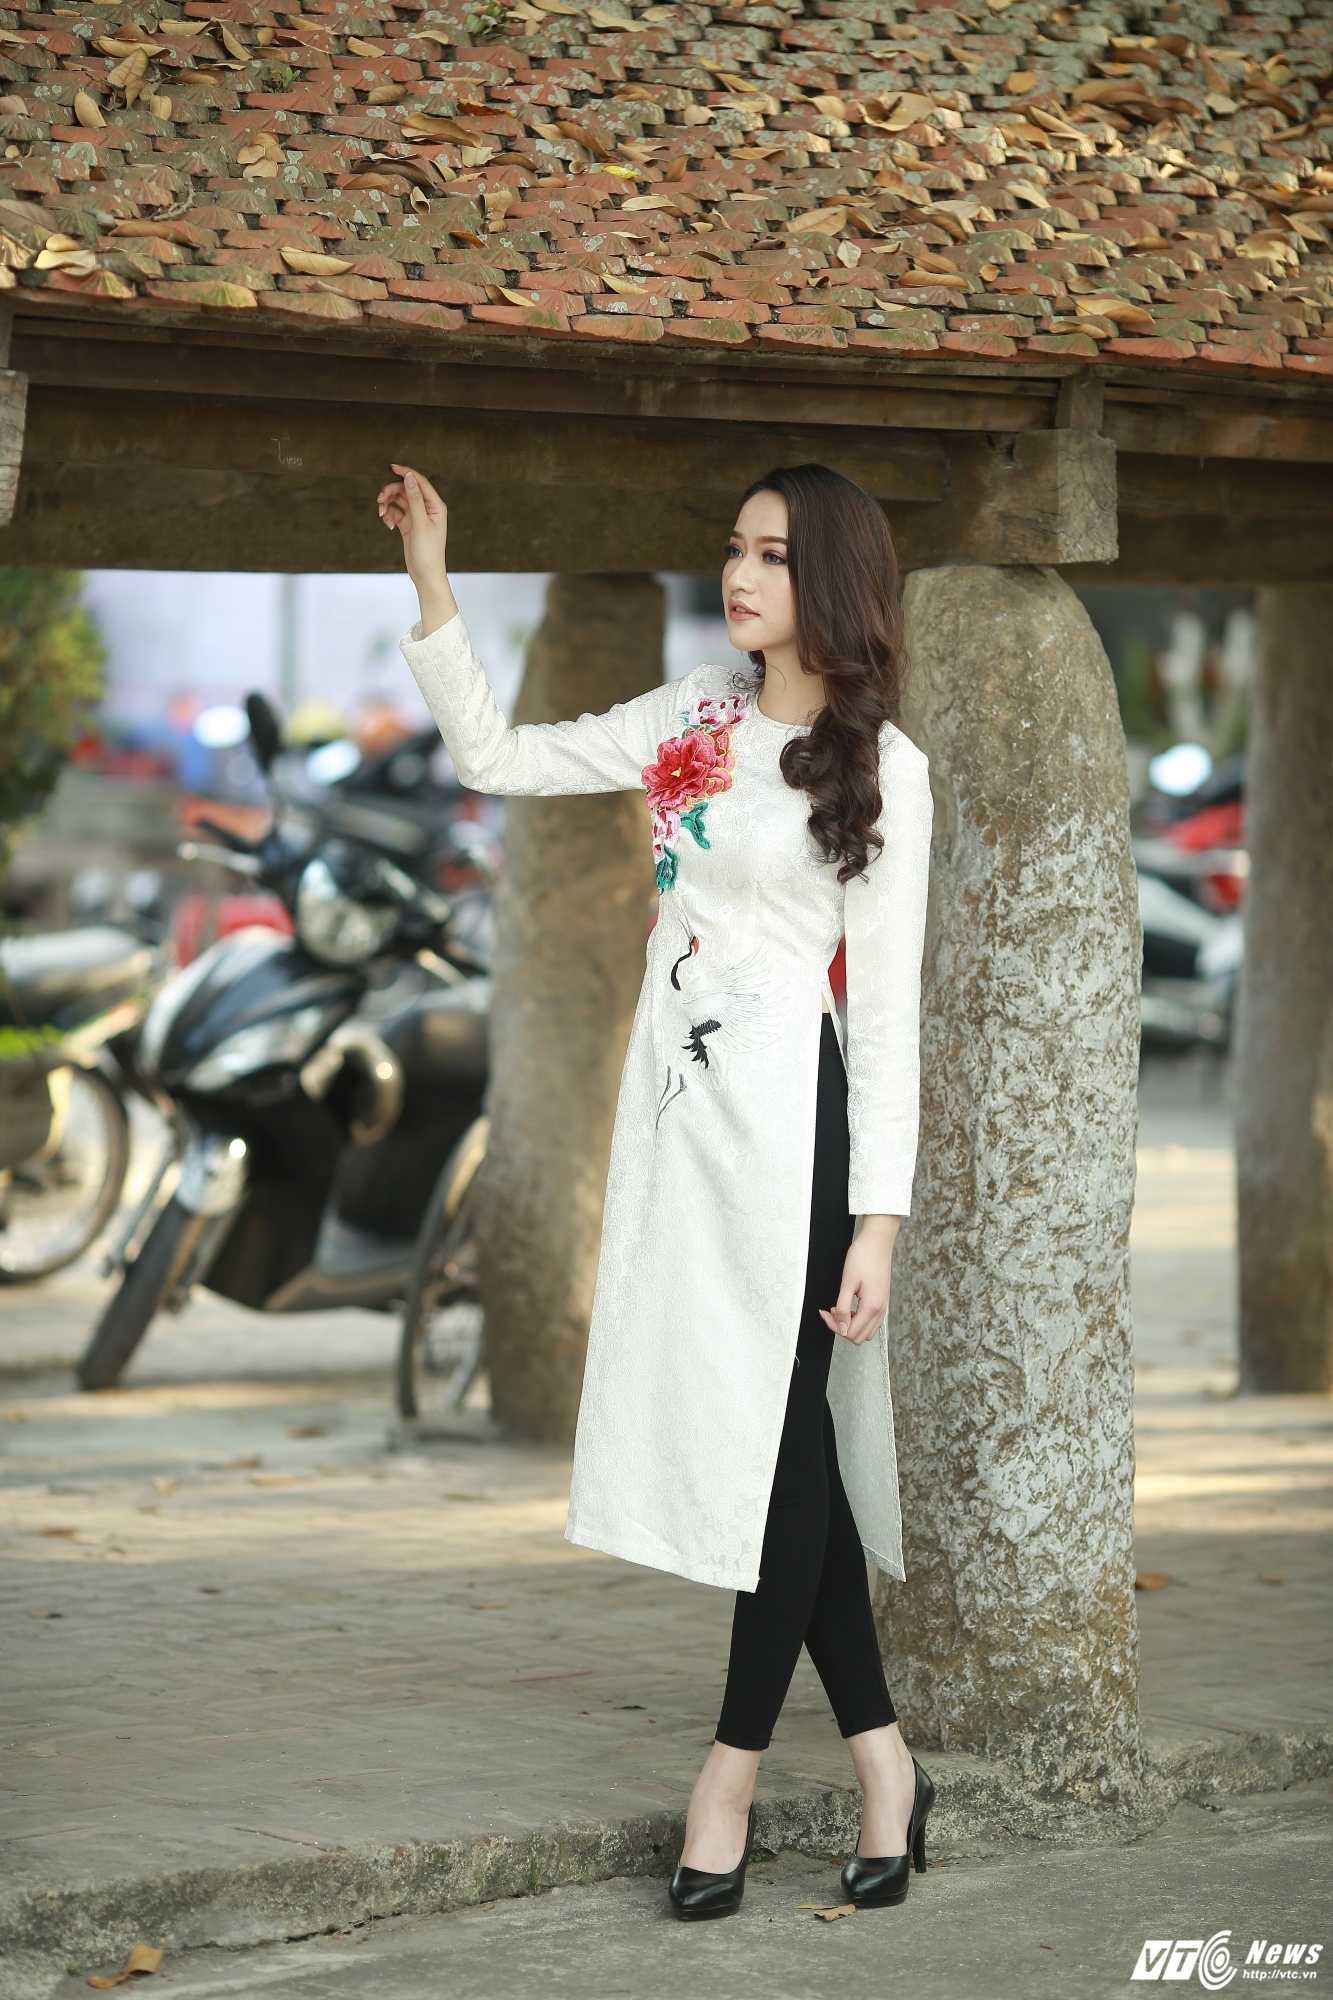 Nhan sac xinh dep cua Hoa khoi 'Nguoi dep Kinh Bac 2017' hinh anh 8